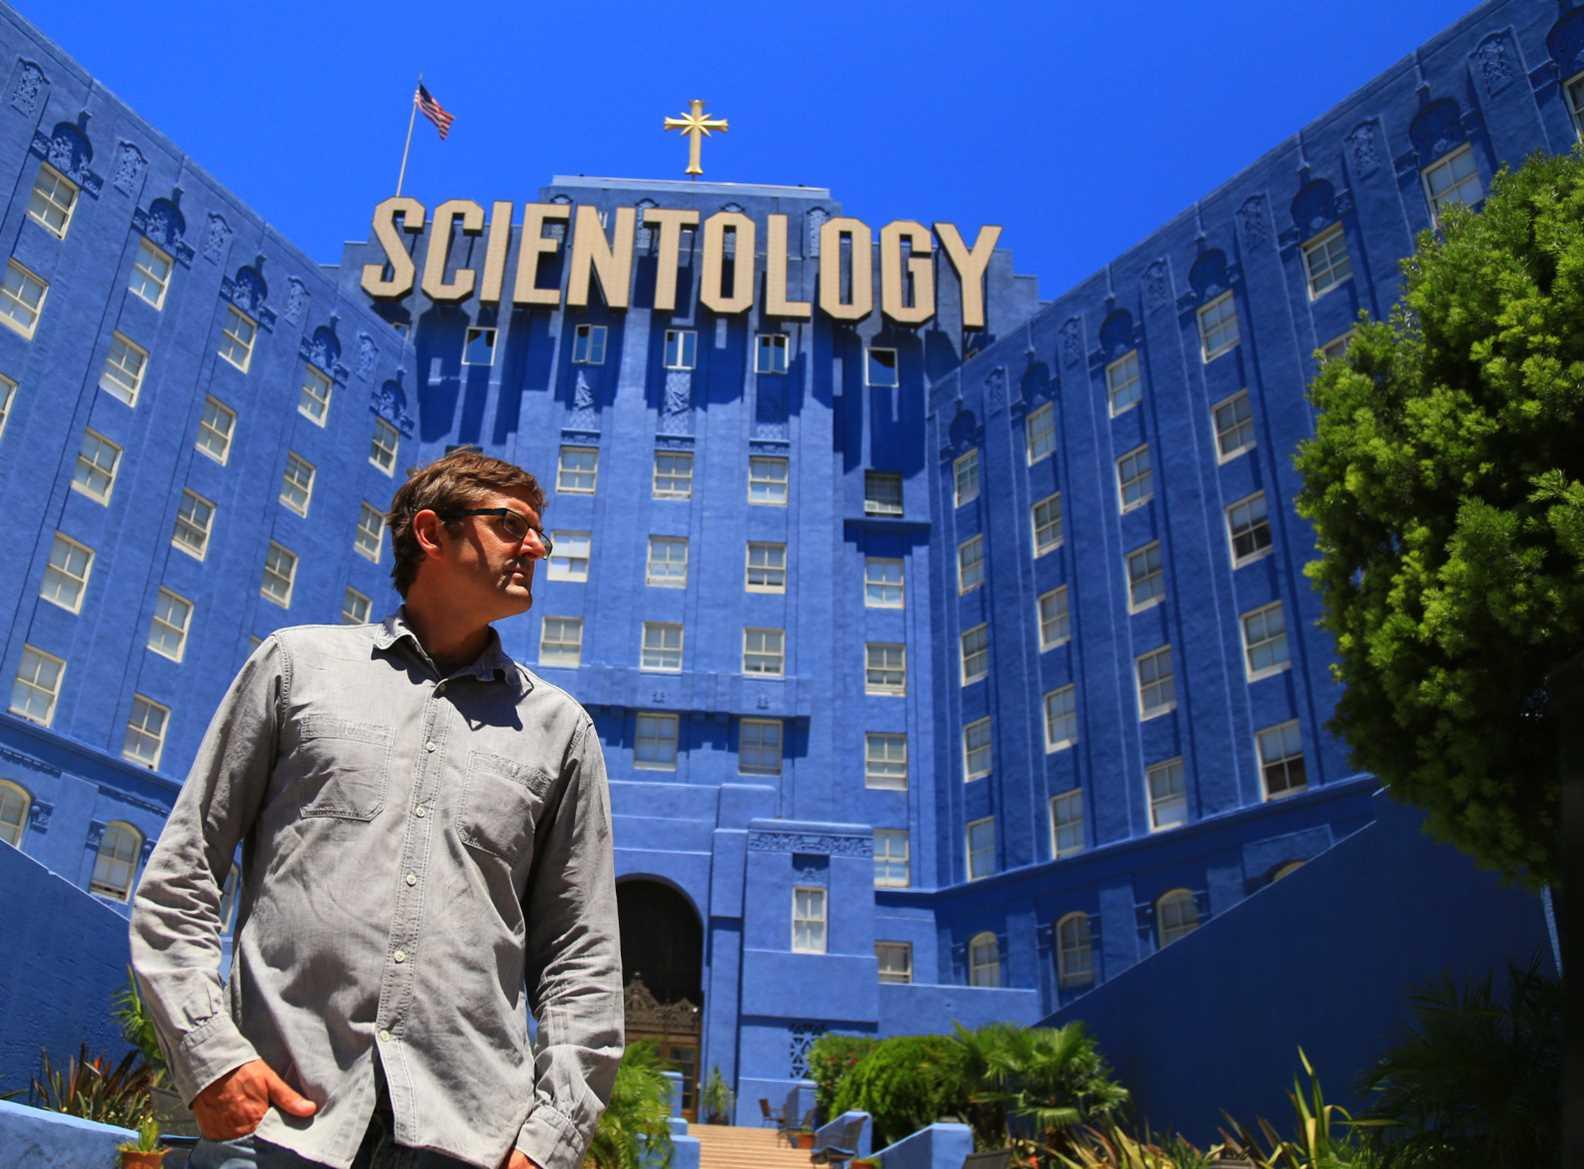 scientology - photo #24